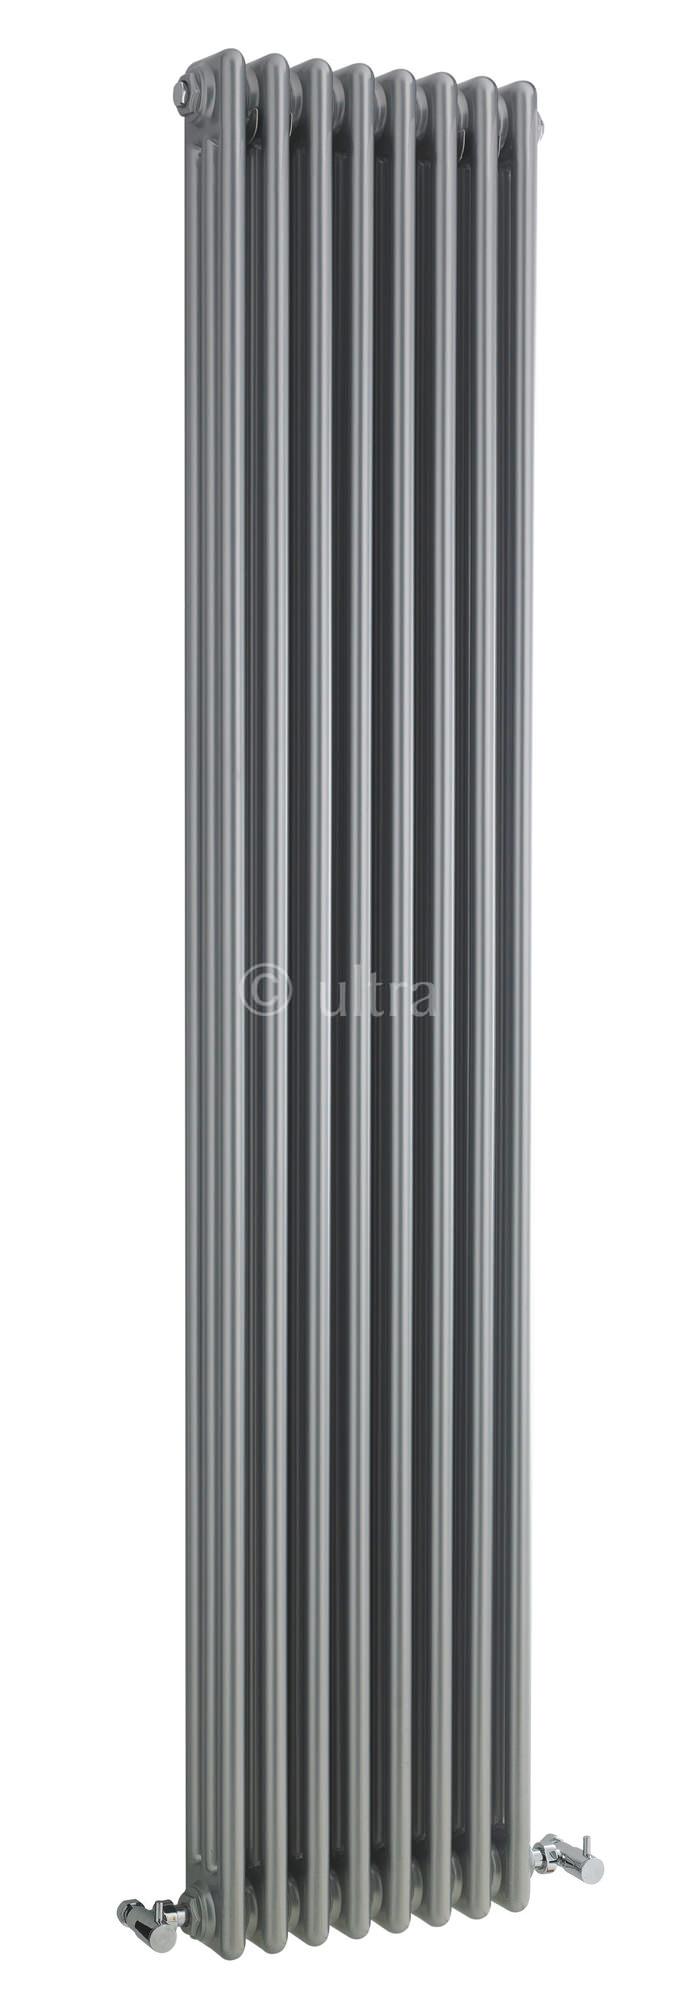 Ultra Colosseum Triple Column 381 X 1800mm Silver Radiator